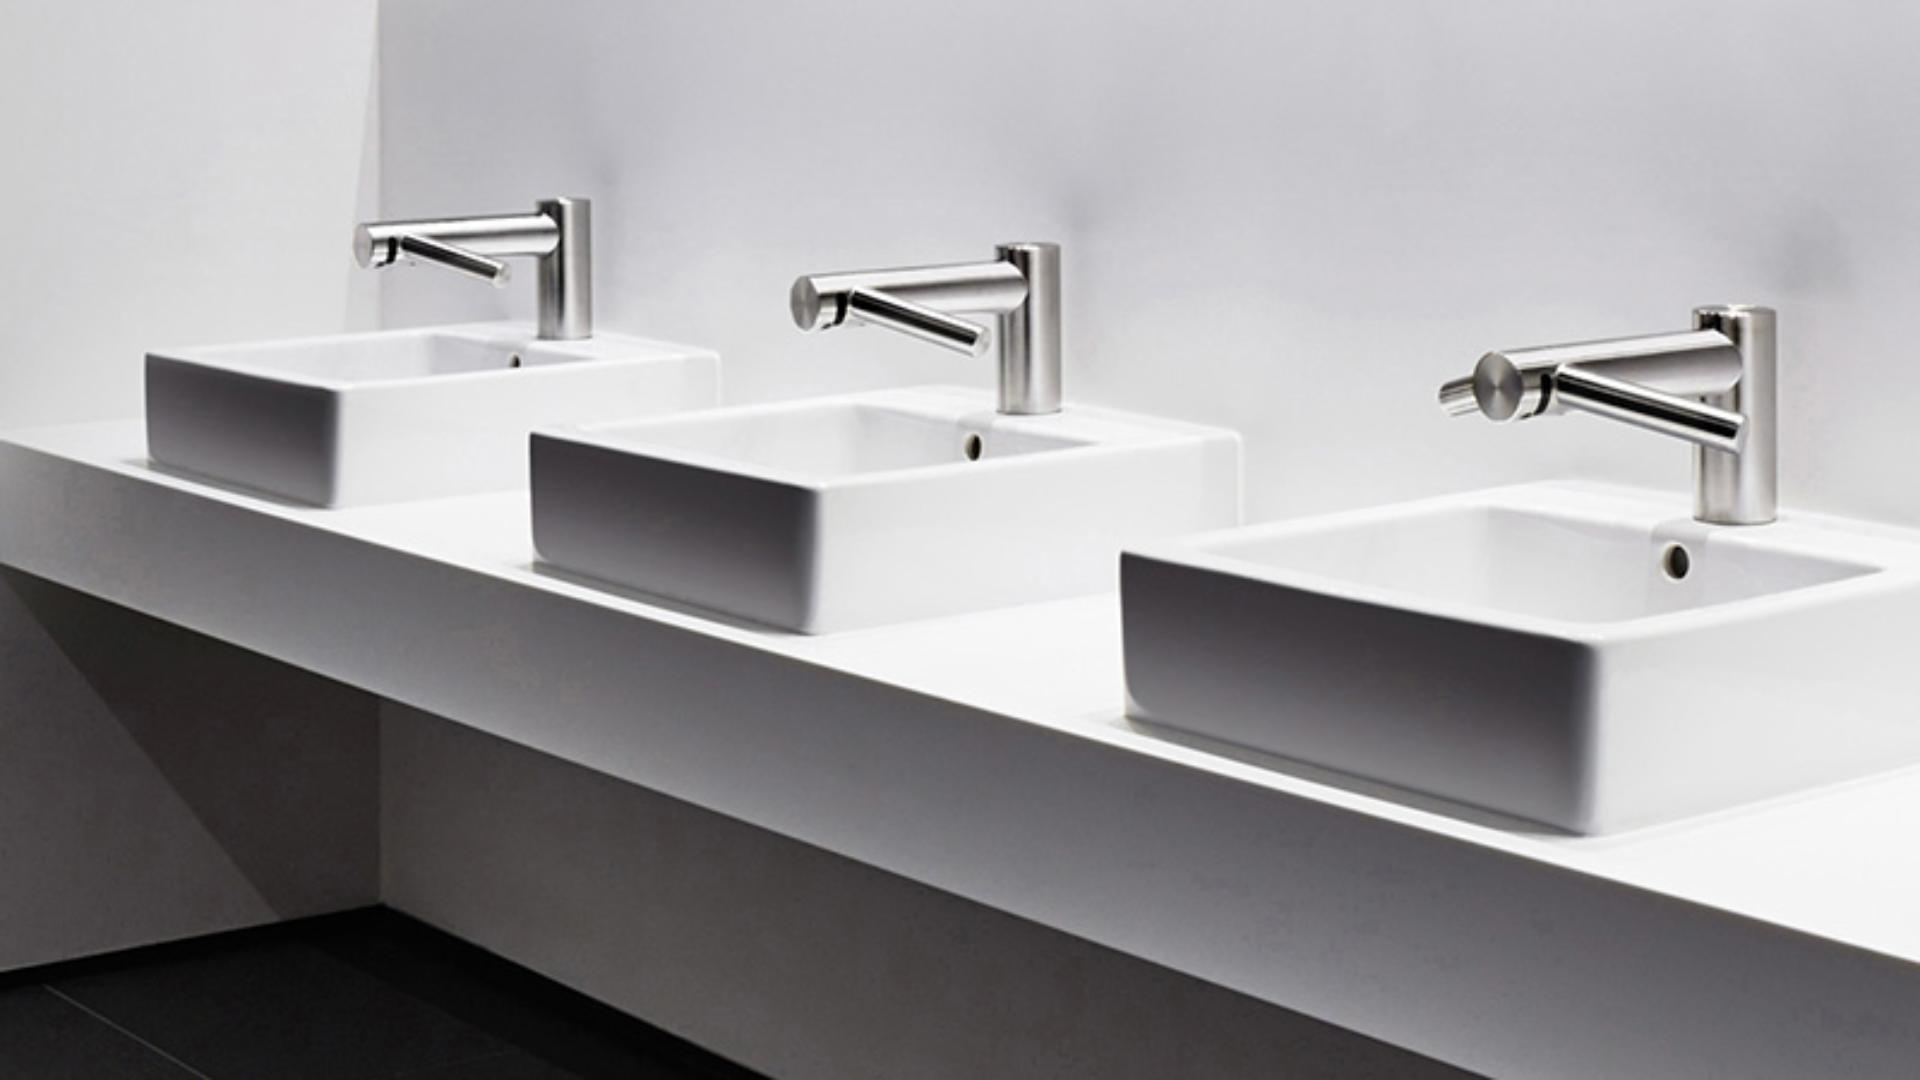 Three Dyson Airblade Wash+Dry hand dryers